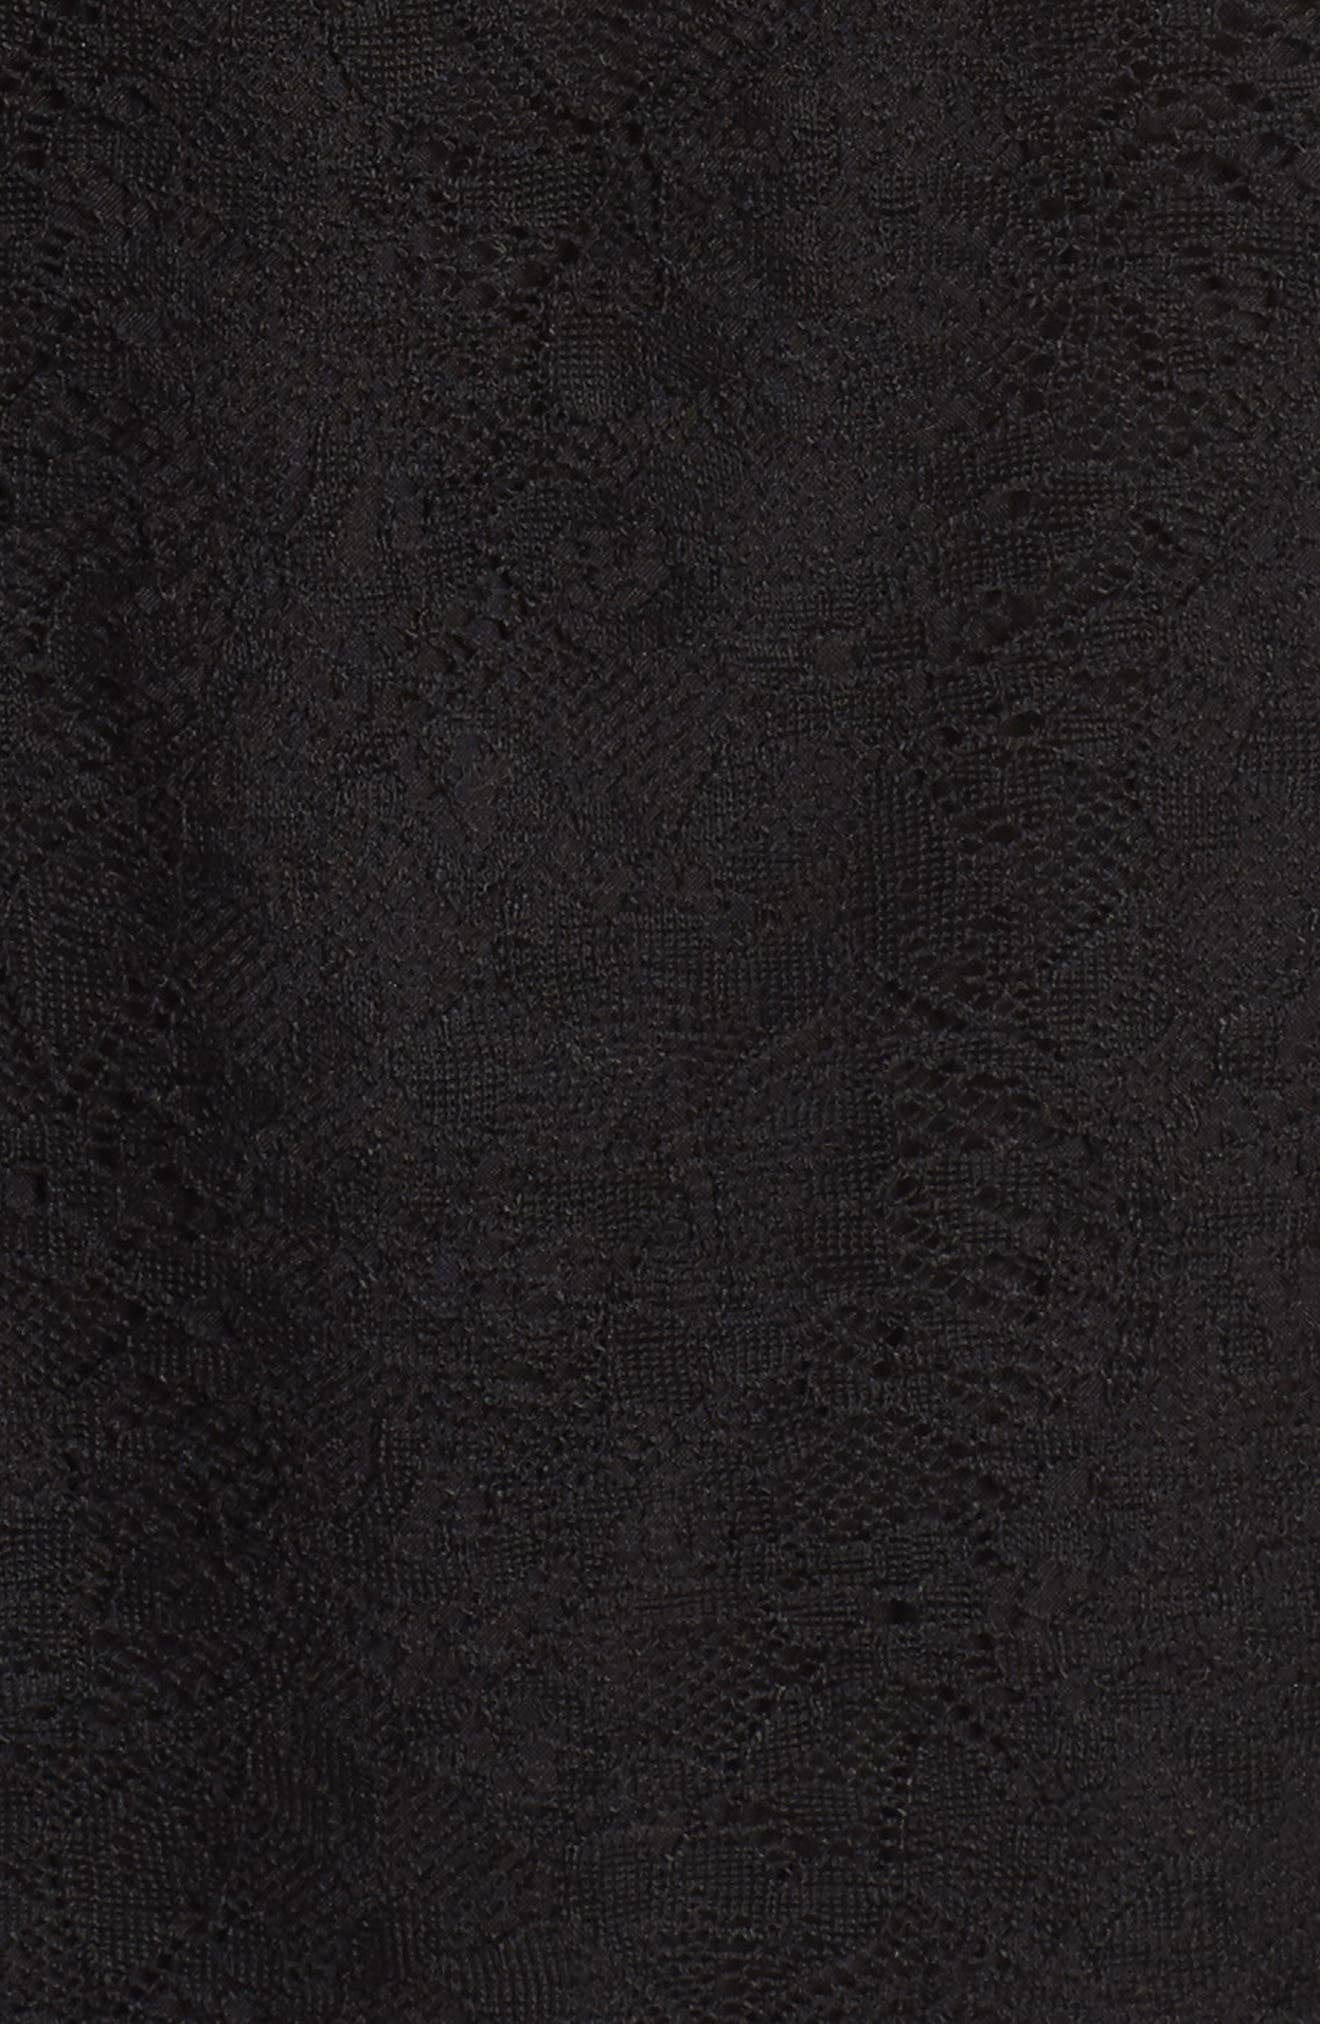 Ruffle Lace Top,                             Alternate thumbnail 6, color,                             Black